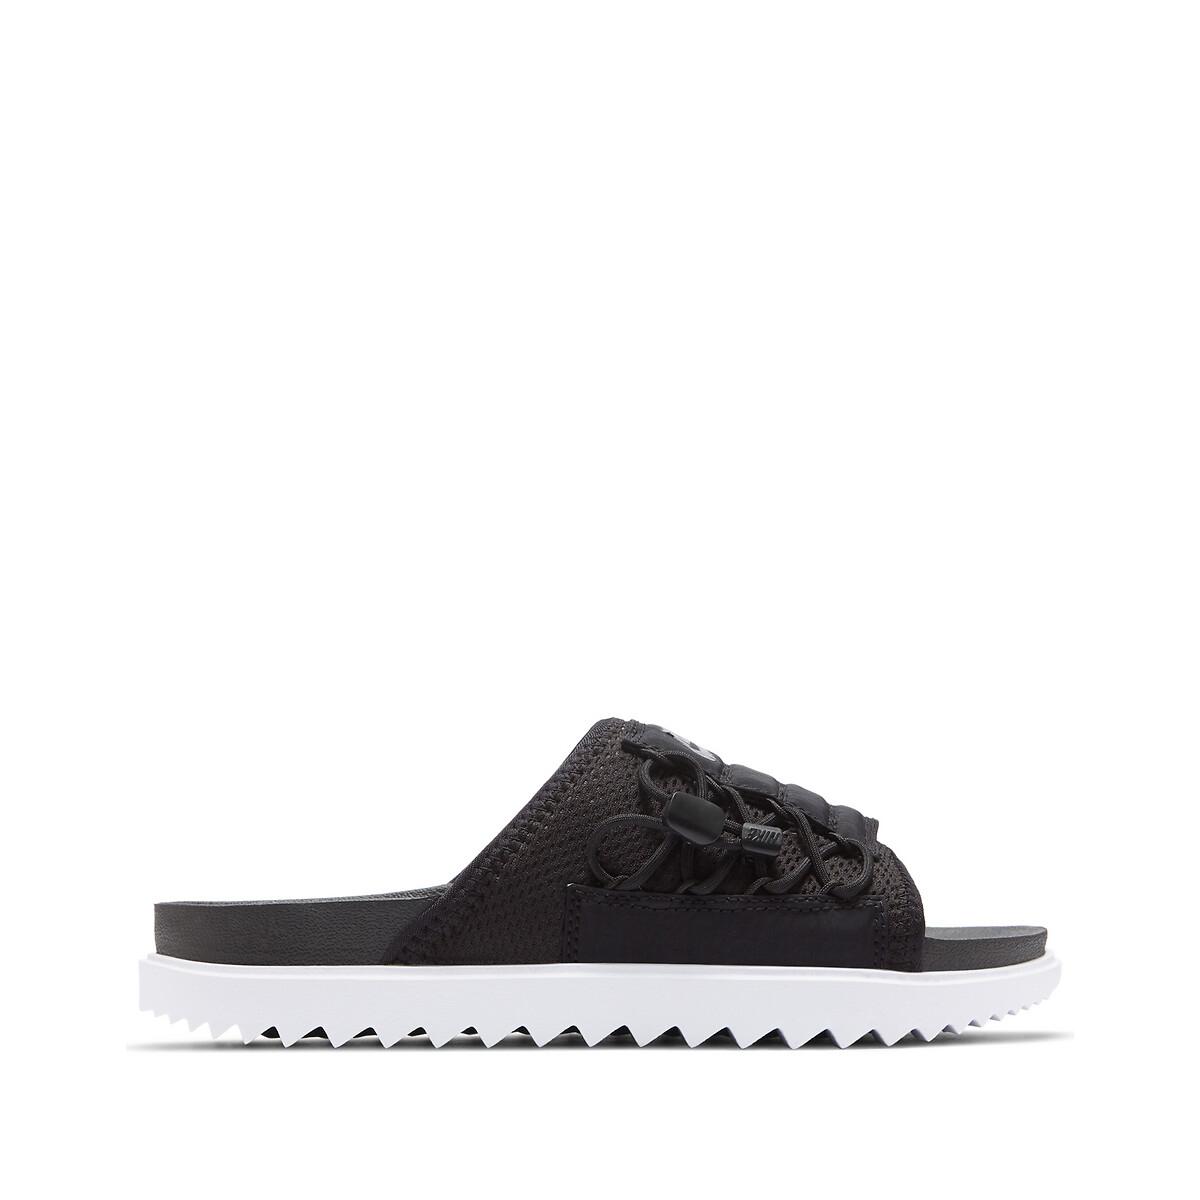 Nike Asuna Slippers Dames Black/White/Anthracite Dames online kopen